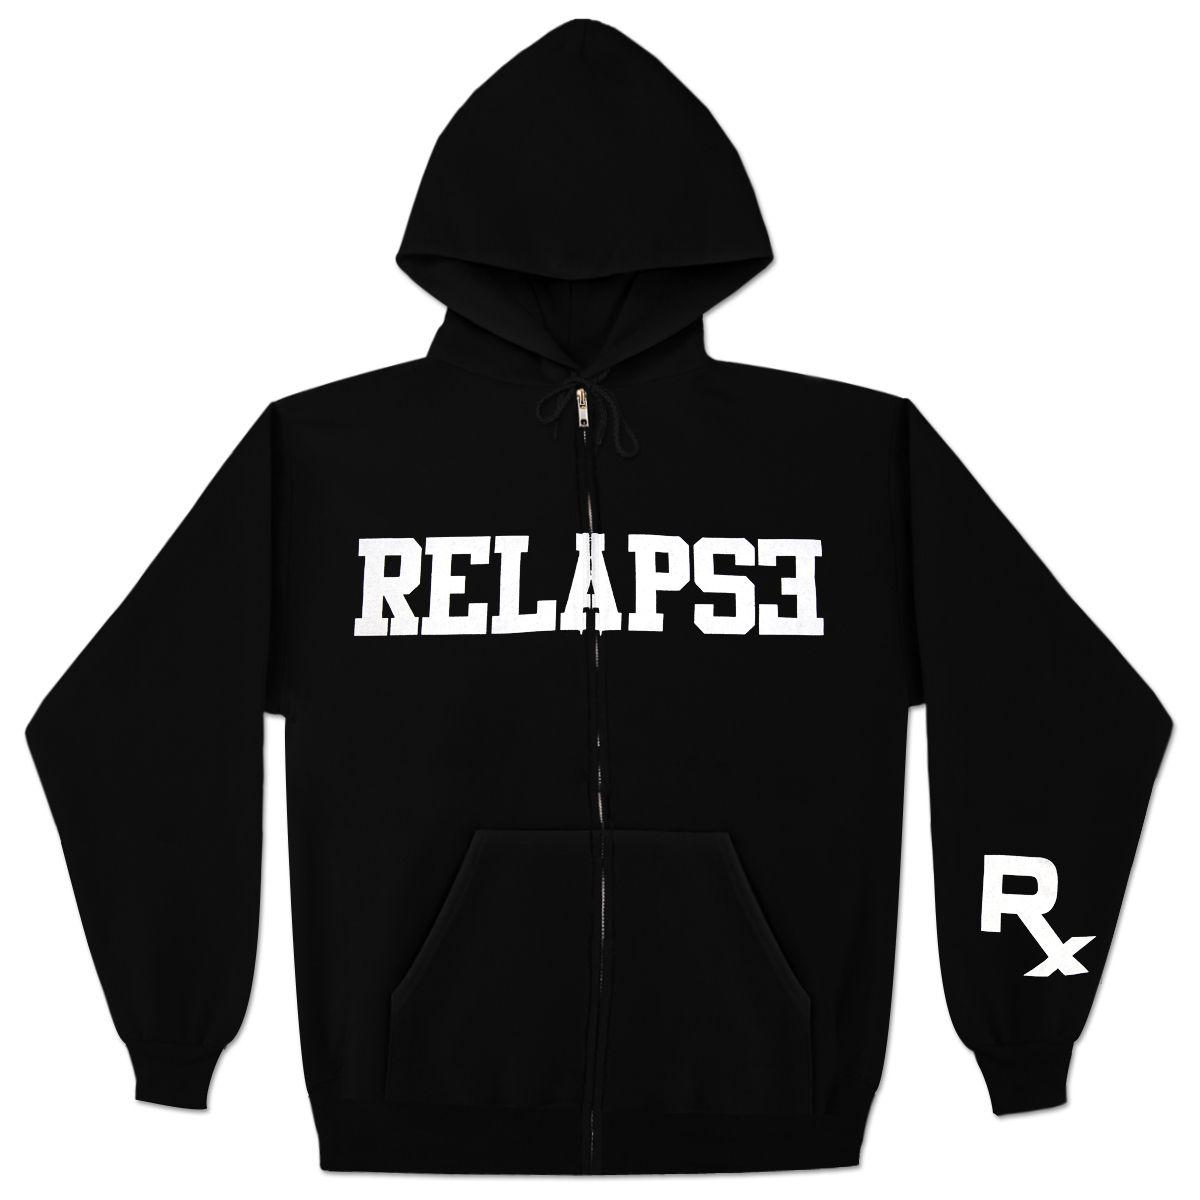 638dd487a6b Eminem Relapse Zip Hoodie  70.00